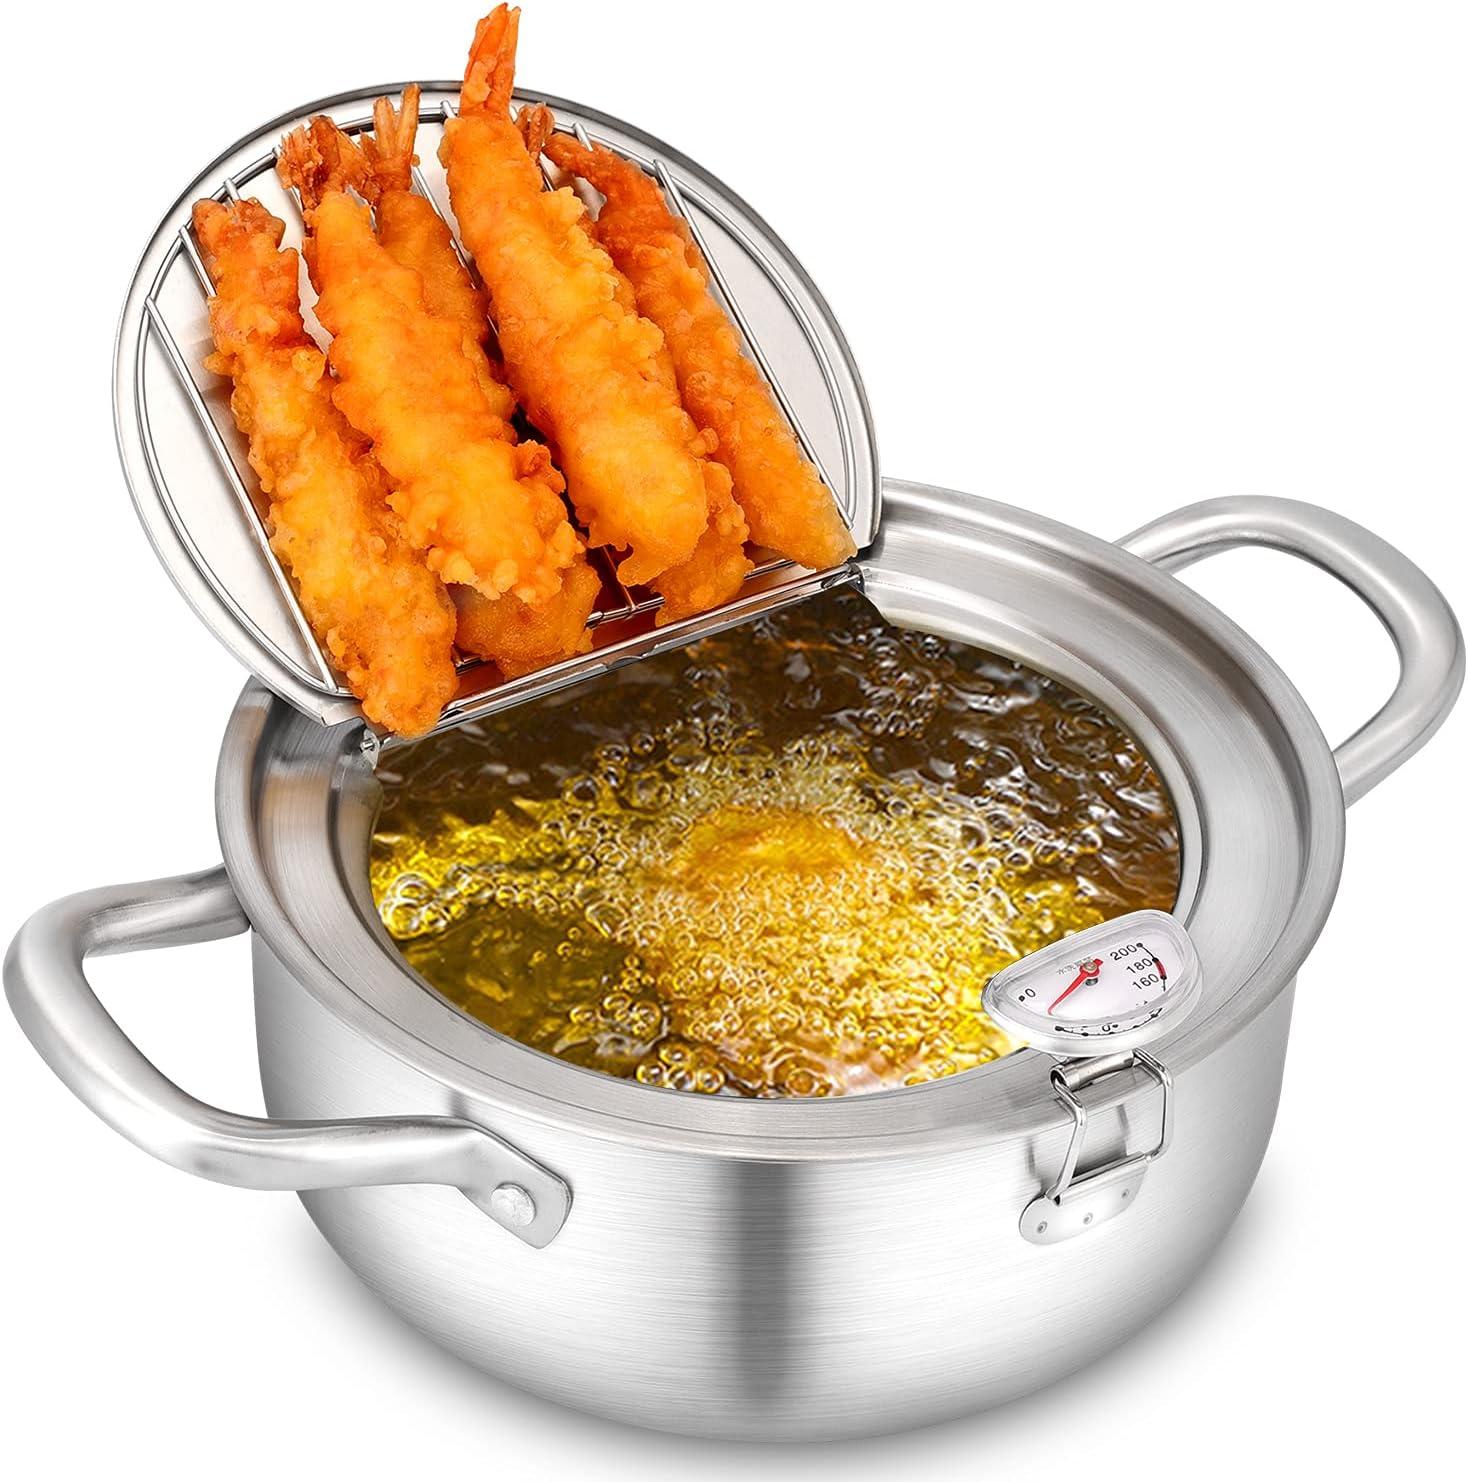 Maocaa Tempura Deep Fry Pot, 304 Stainless Steel Tempura Fryer with Thermometer, Lid Japanese Style Tempura Fryer Pan Uncoated Fryer (7.9)